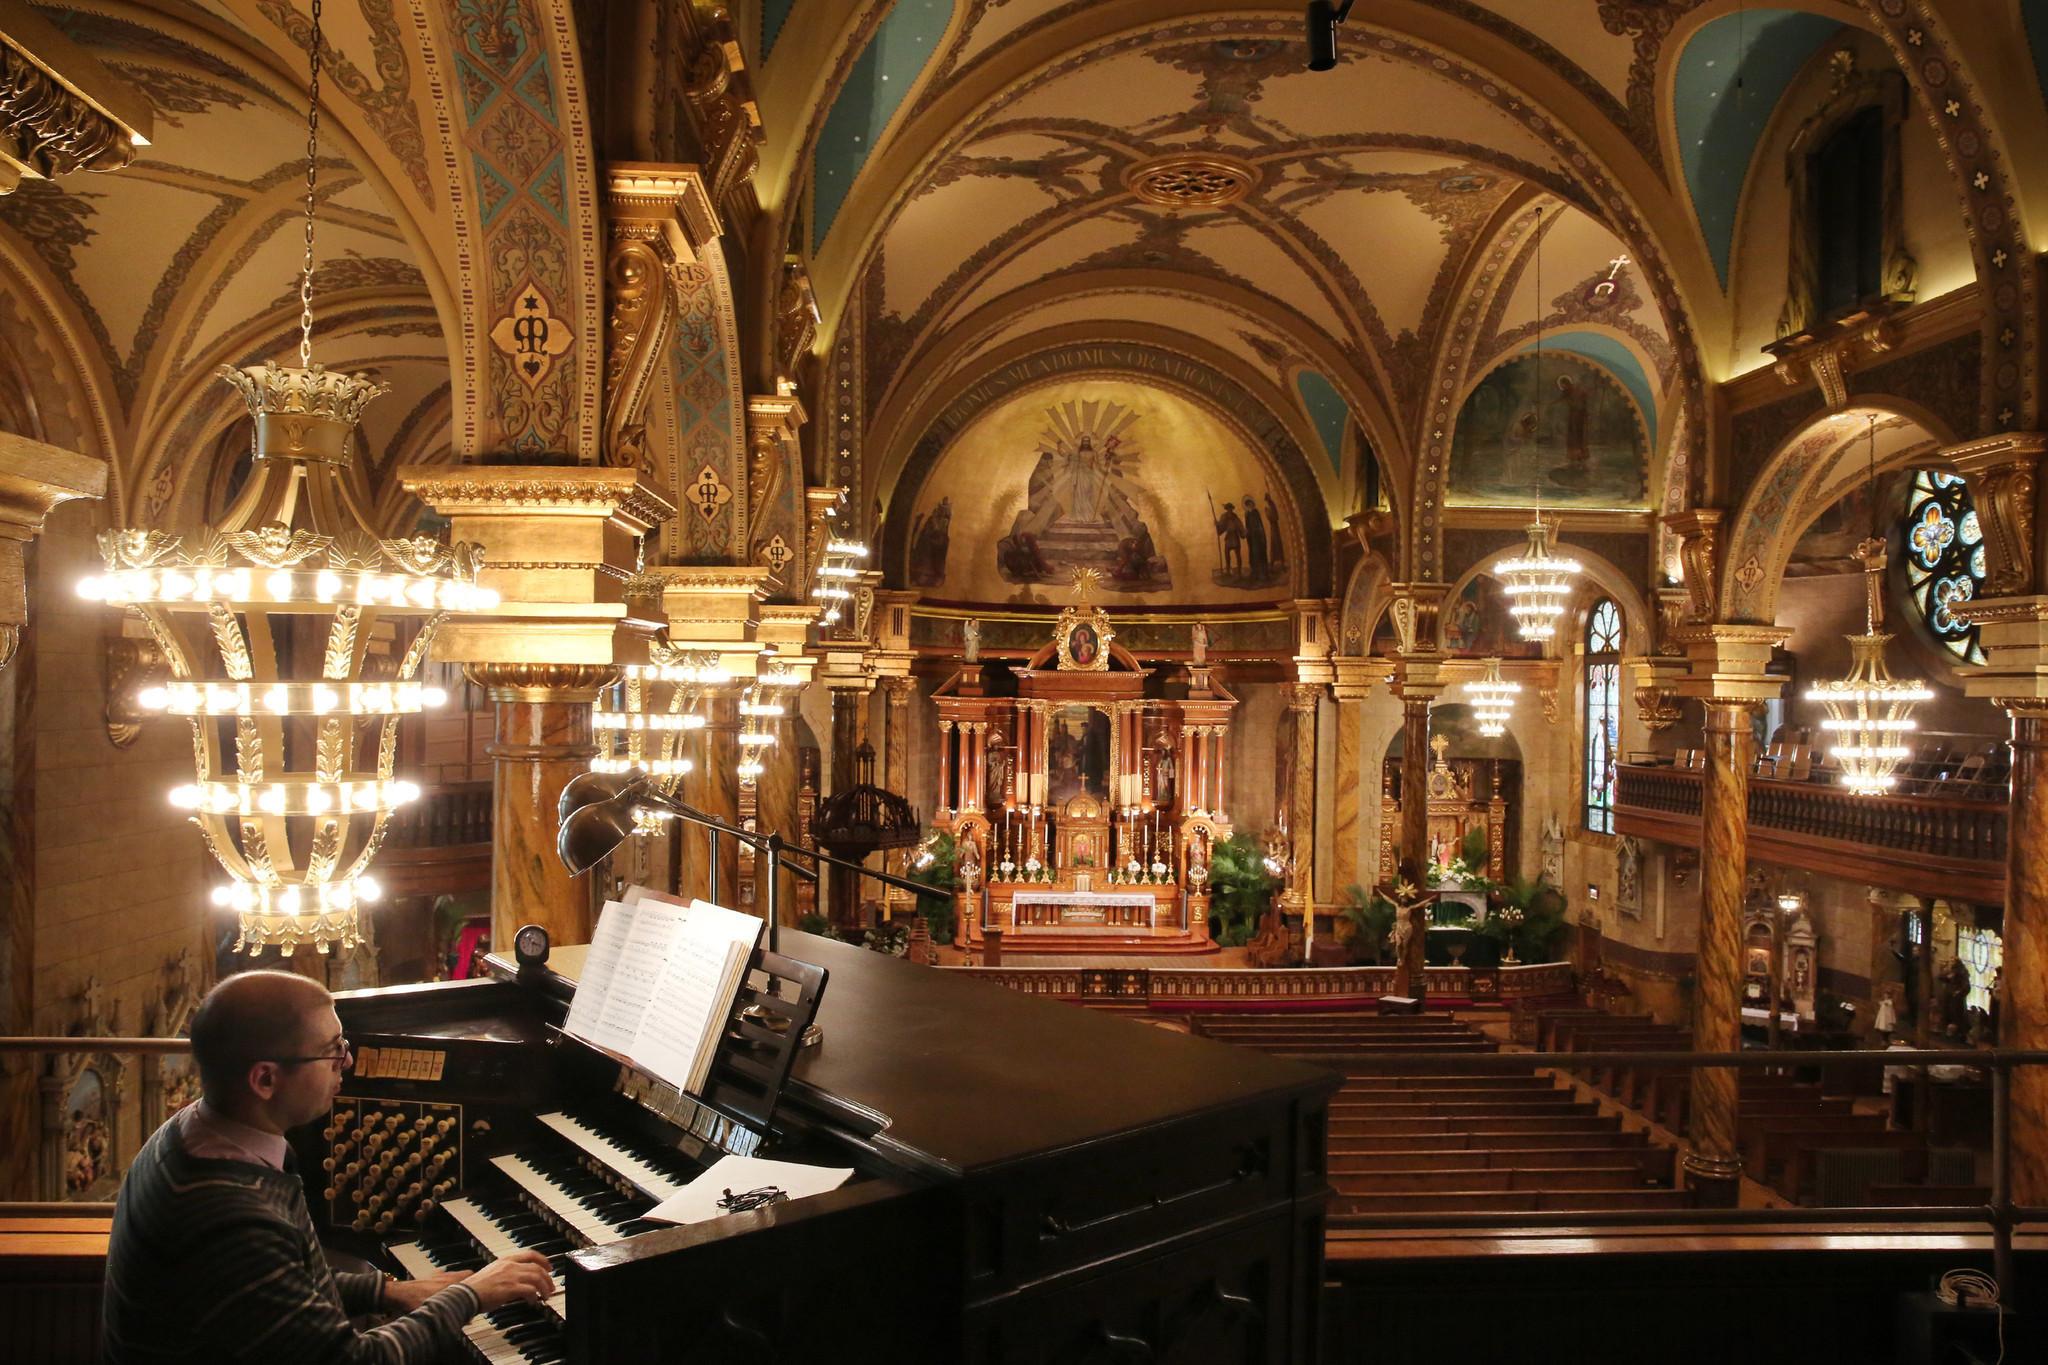 St Reviews >> St. John Cantius, most beautiful Catholic church - Chicago Tribune